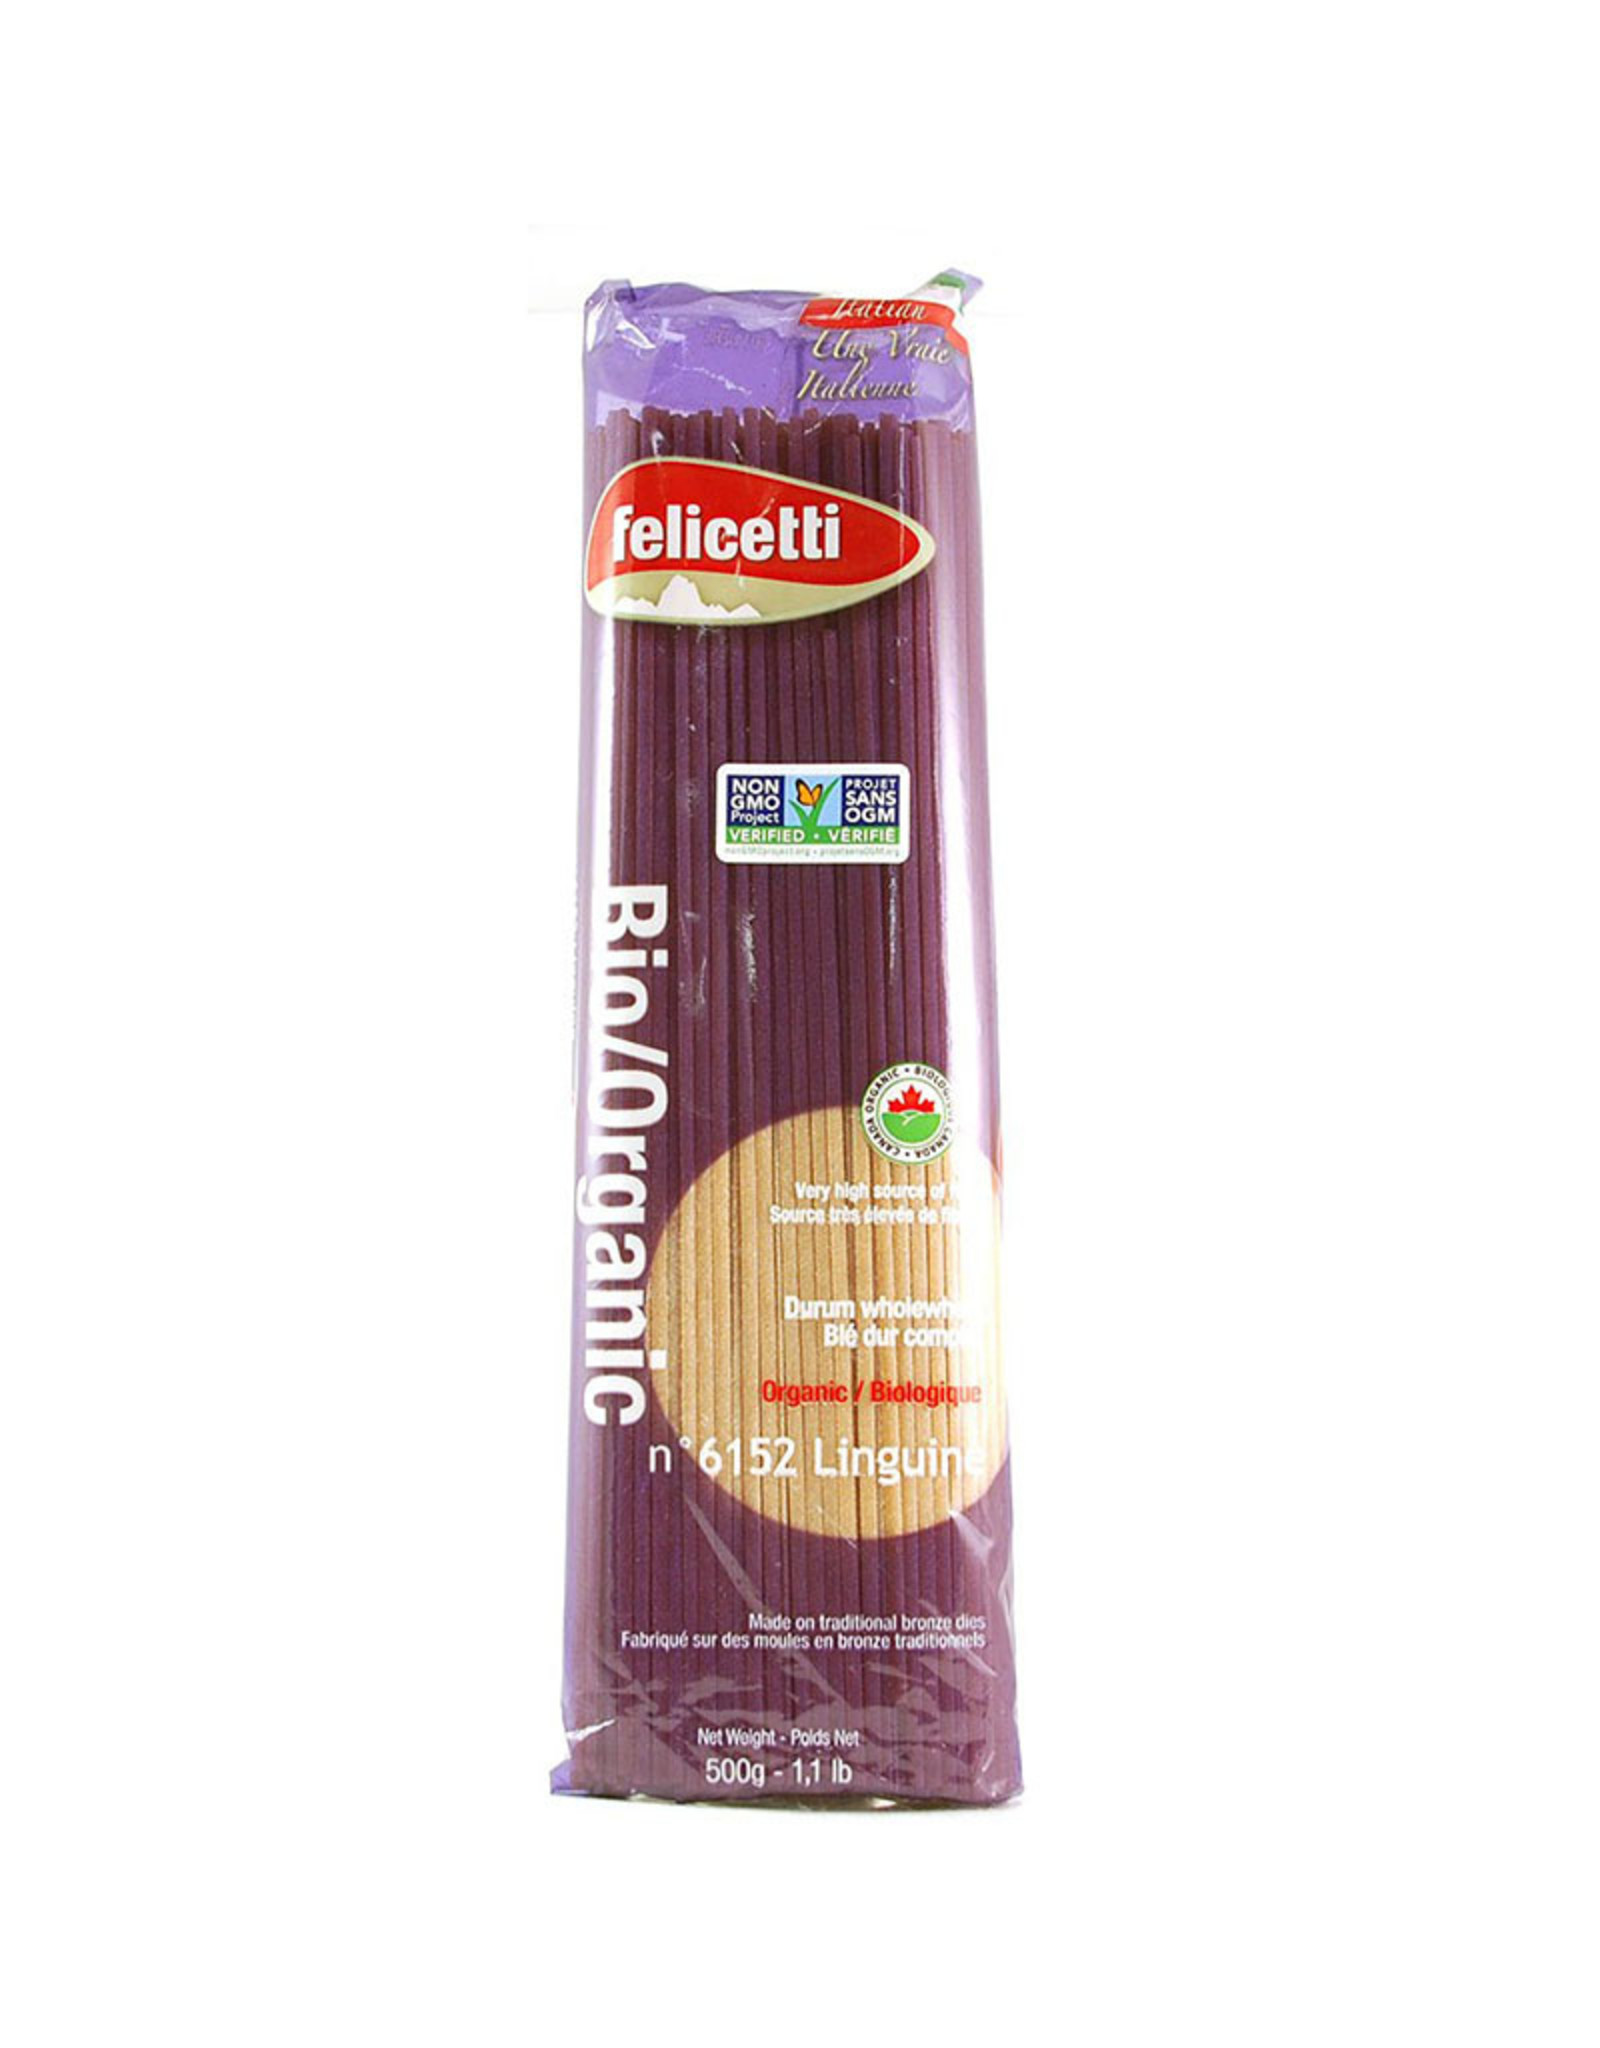 Felicetti Pasta Felicetti Pasta - Pâtes, Linguine Blé Complet (500g)